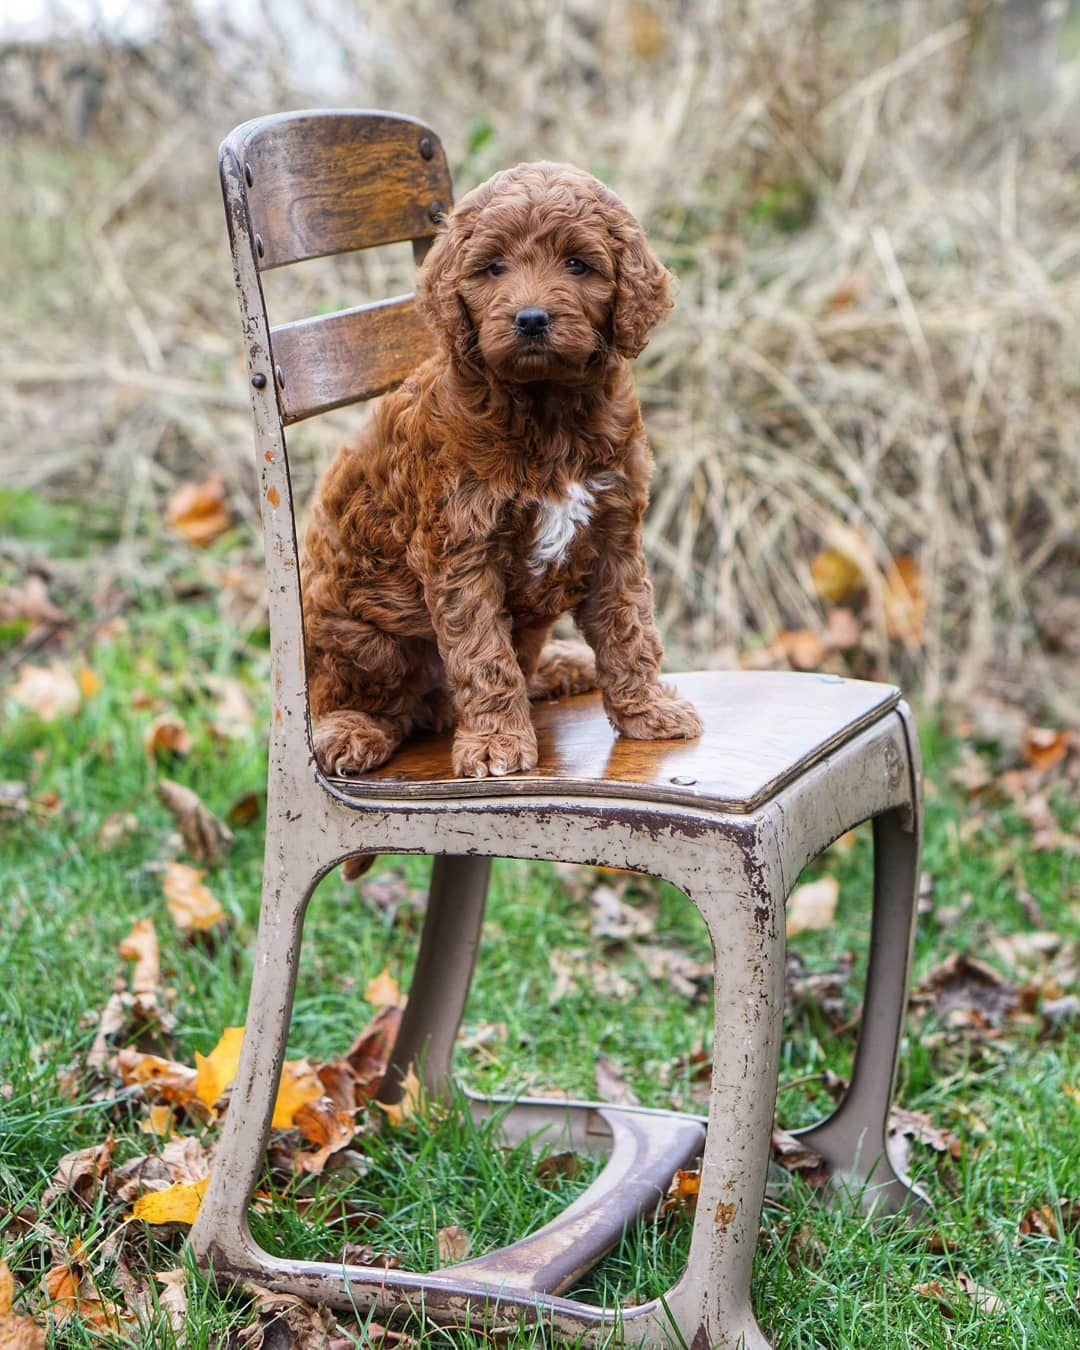 Look Who Is 6 Weeks Old Today Miniirishdoodle Dogsofinstagram Puppiesofinstagram Puppytales Doodletales Rowandoodles To Irish Doodle Dog Photos Puppies